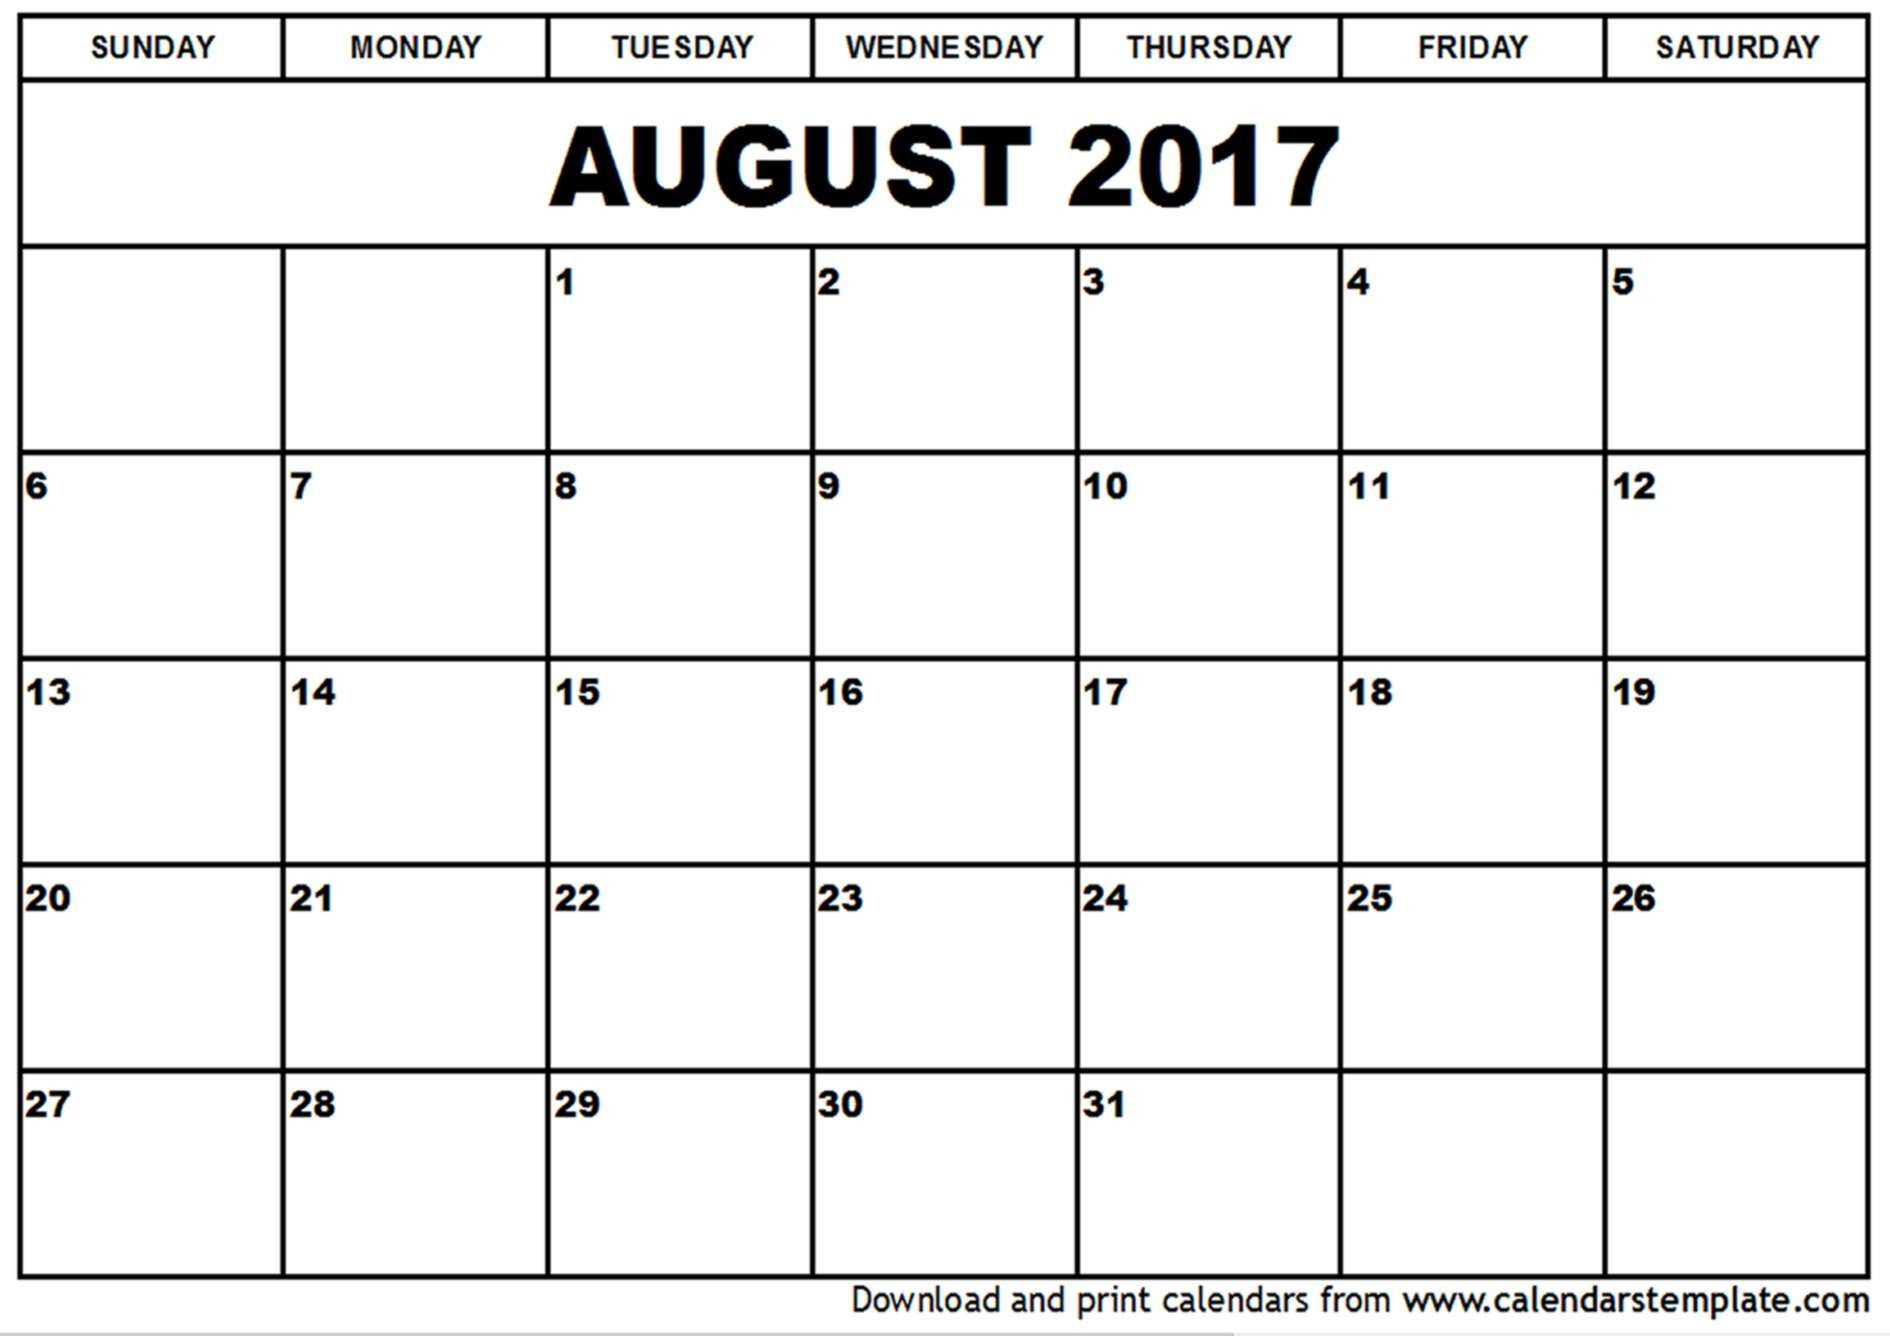 August 2017 Printable Calendar | August 2017 Calendar | Pinterest - Free Printable August 2017